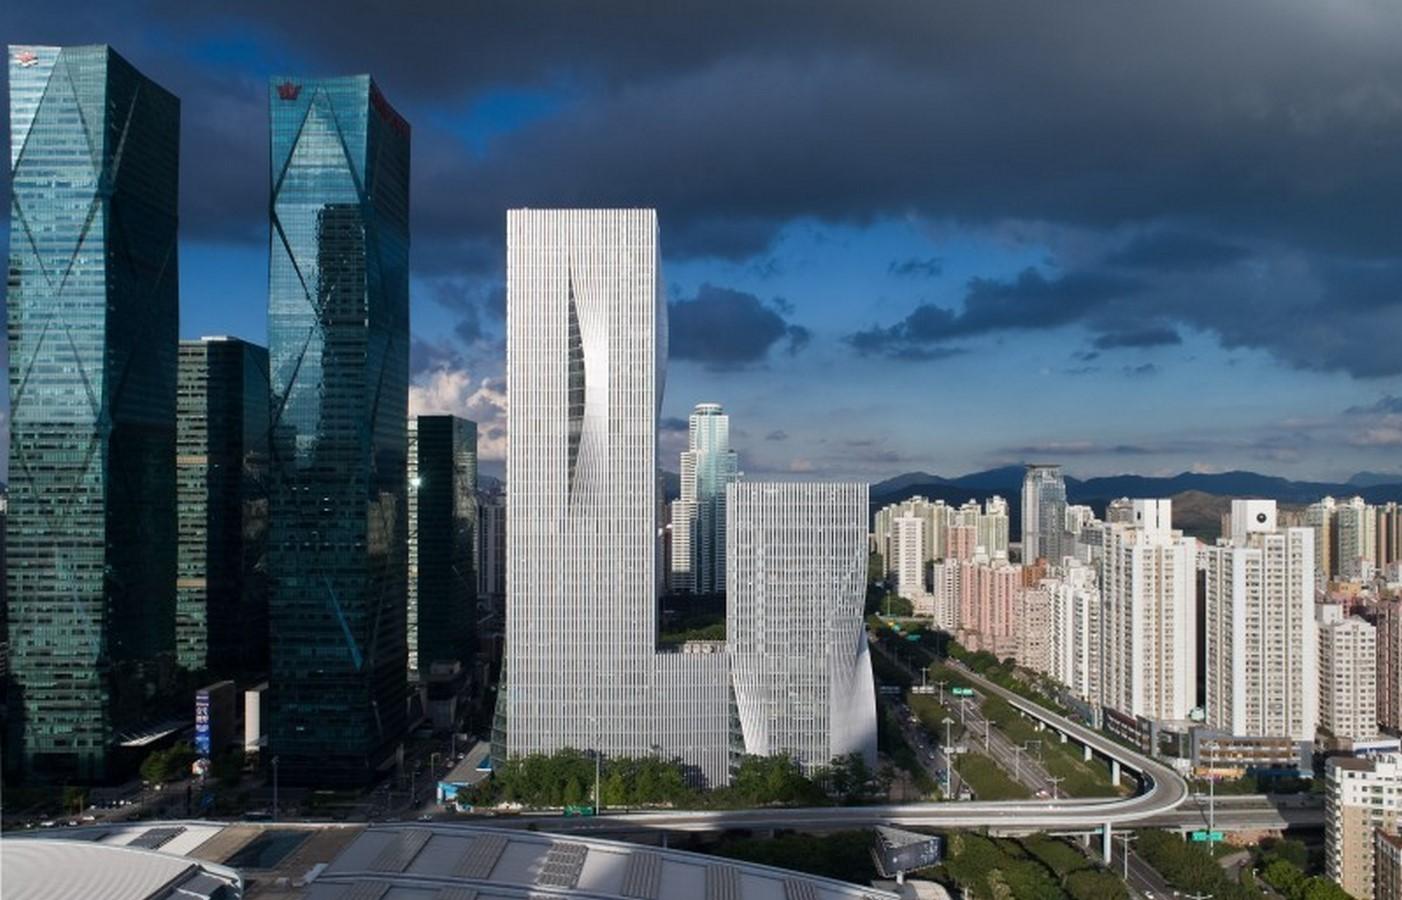 Shenzhen International Energy Mansion by BIG: The uncommon facade design - Sheet1